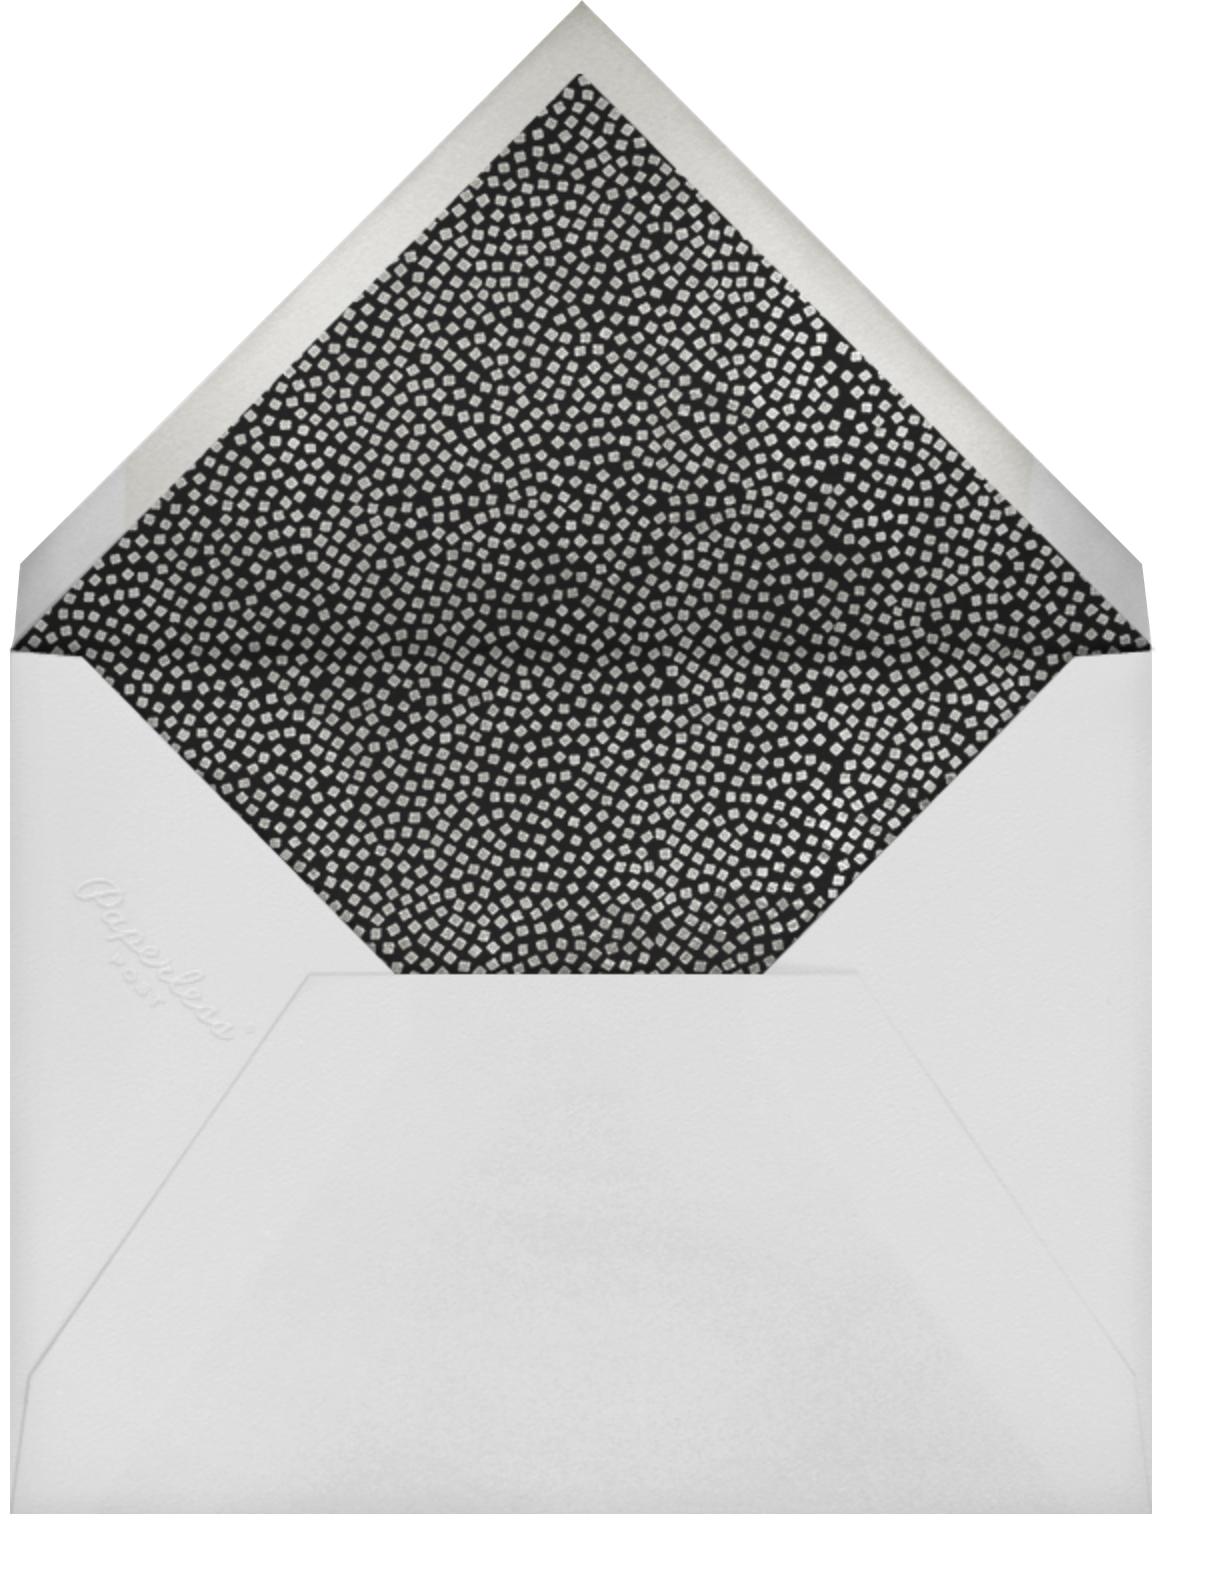 Konfetti (Photo) - Silver - Kelly Wearstler - Adult birthday - envelope back